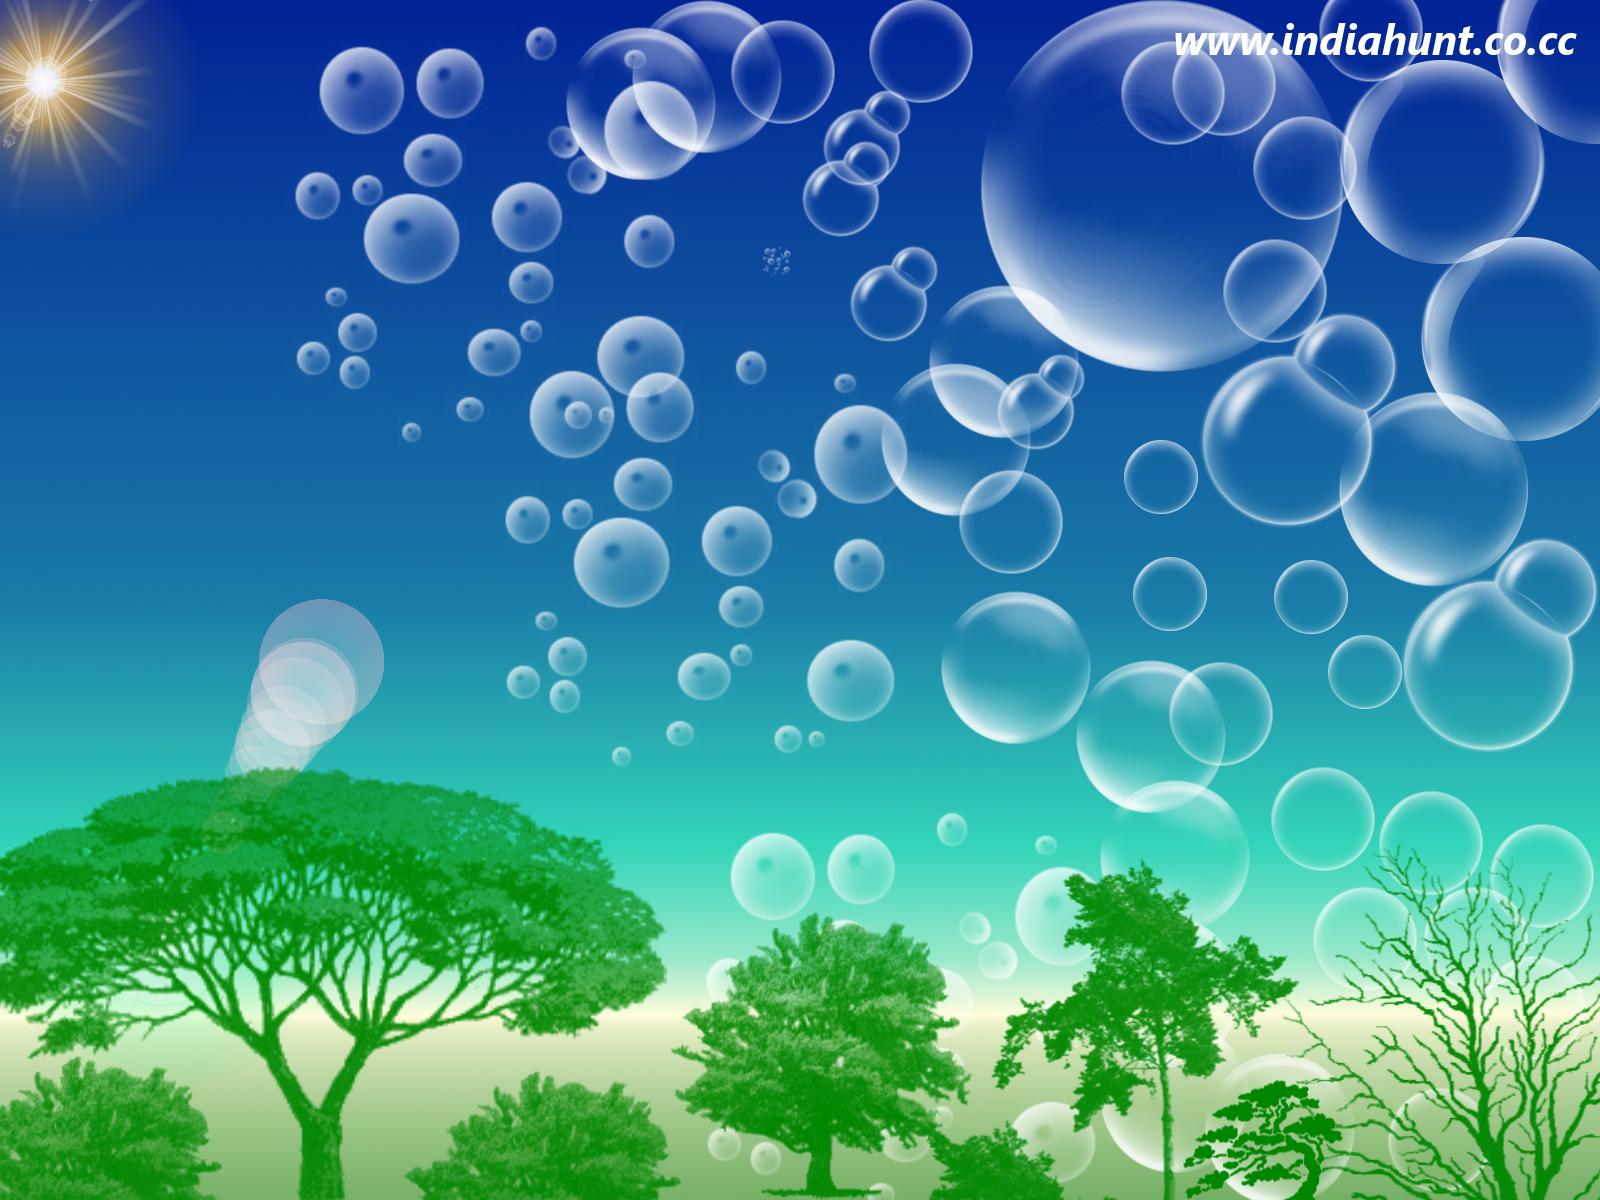 Animated Aquarium Wallpaper Windows 7 894   HD Desktop Wallpaper 1600x1200